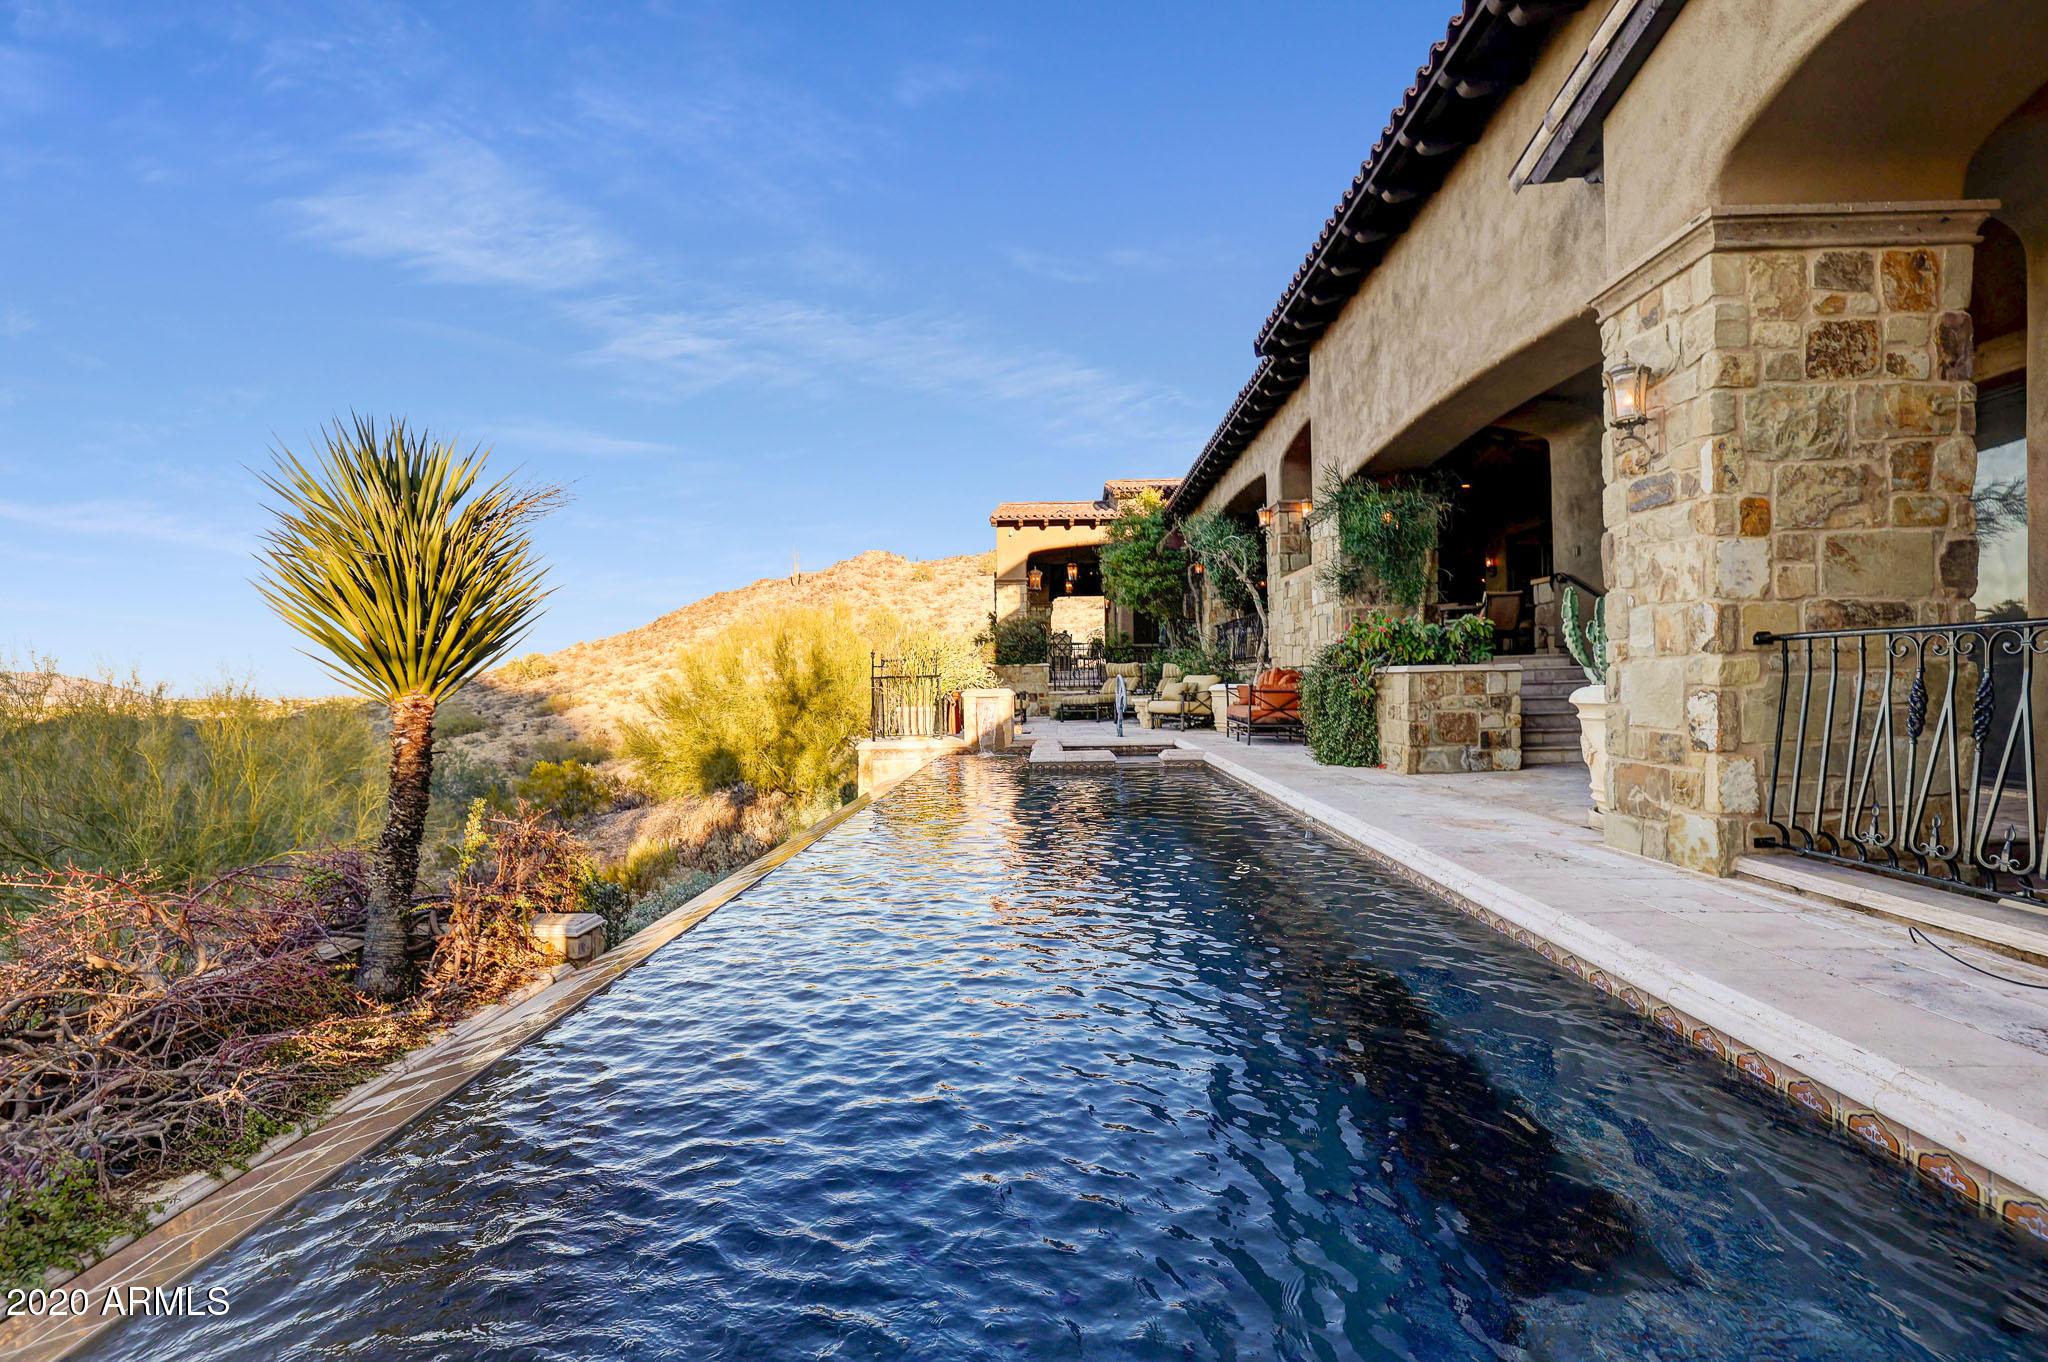 21530 GRANITE RIDGE Road, Buckeye, Arizona 85396, 4 Bedrooms Bedrooms, ,4.5 BathroomsBathrooms,Residential,For Sale,GRANITE RIDGE,6174567